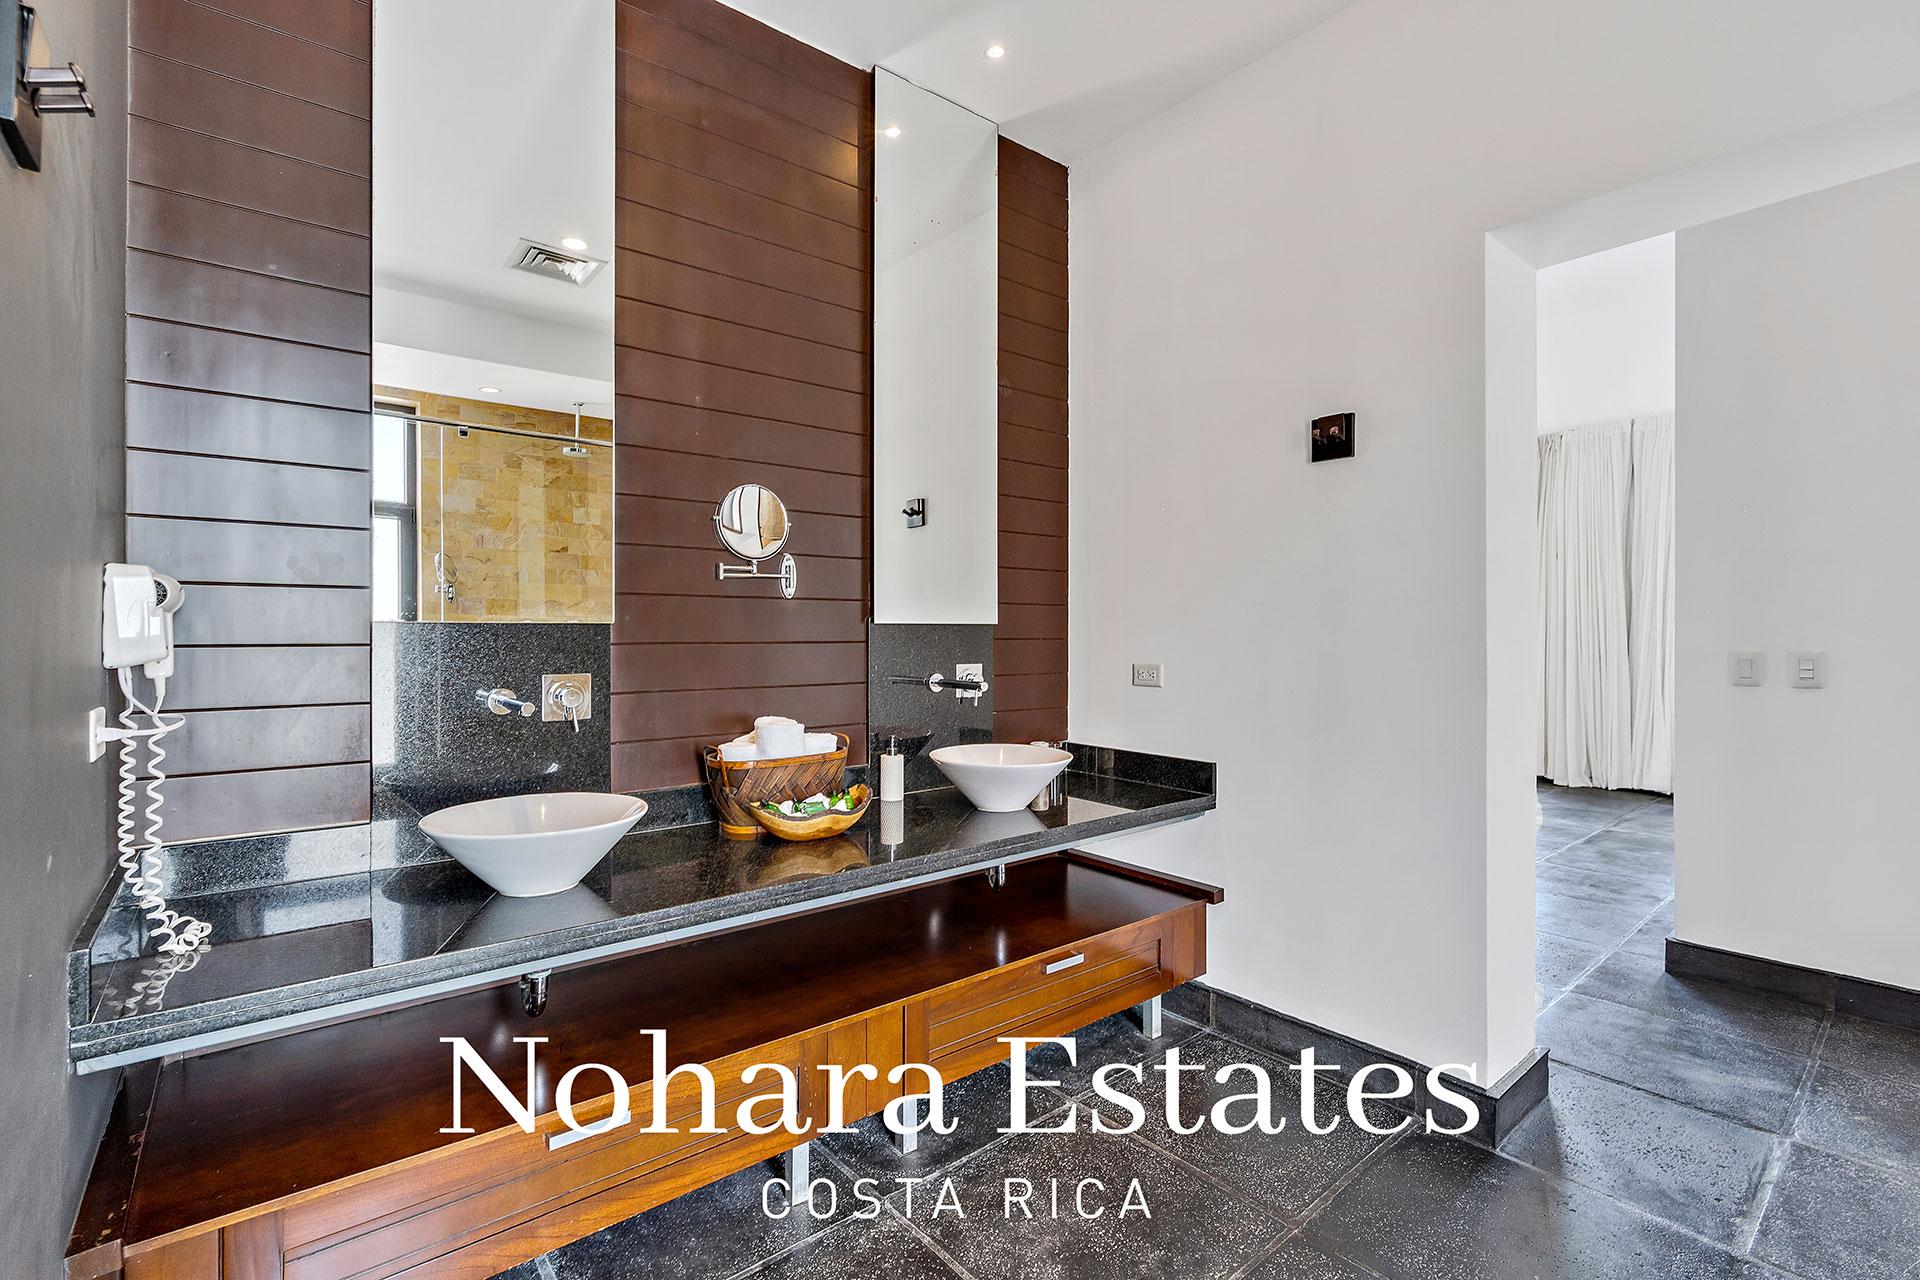 Nohara Estates Costa Rica 128 Penthouse Quepos Los Altos 14